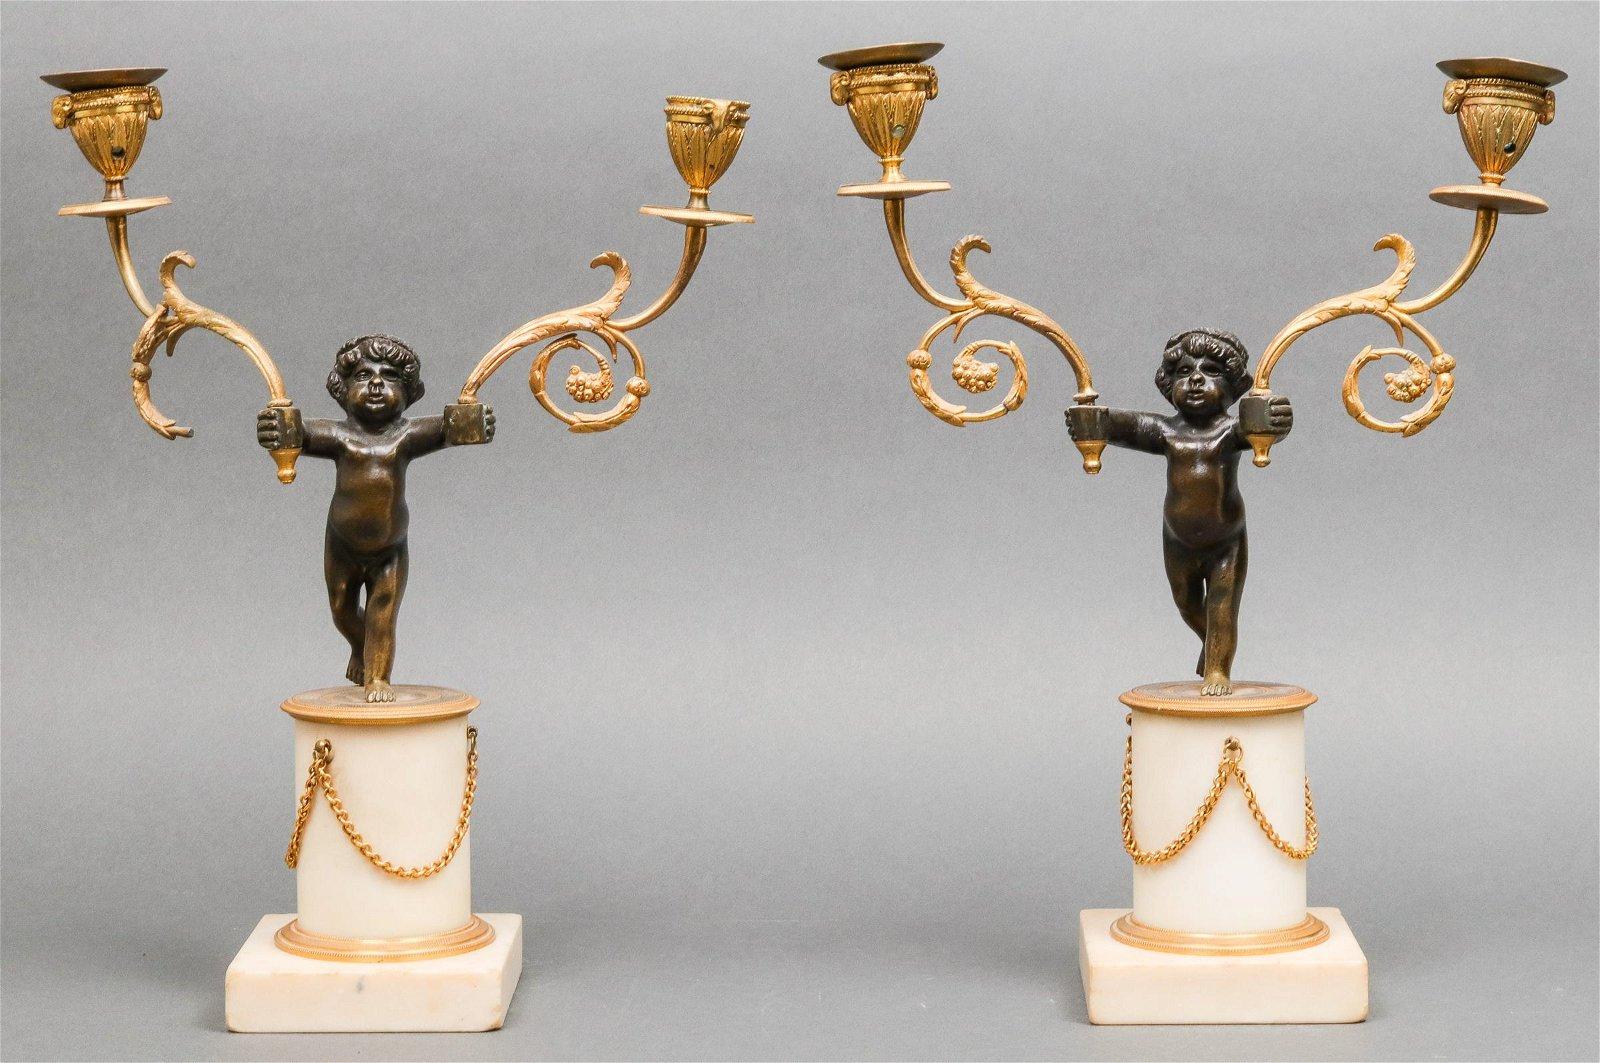 French Ormolu Bronze & Marble Putti Candelabra, Pr